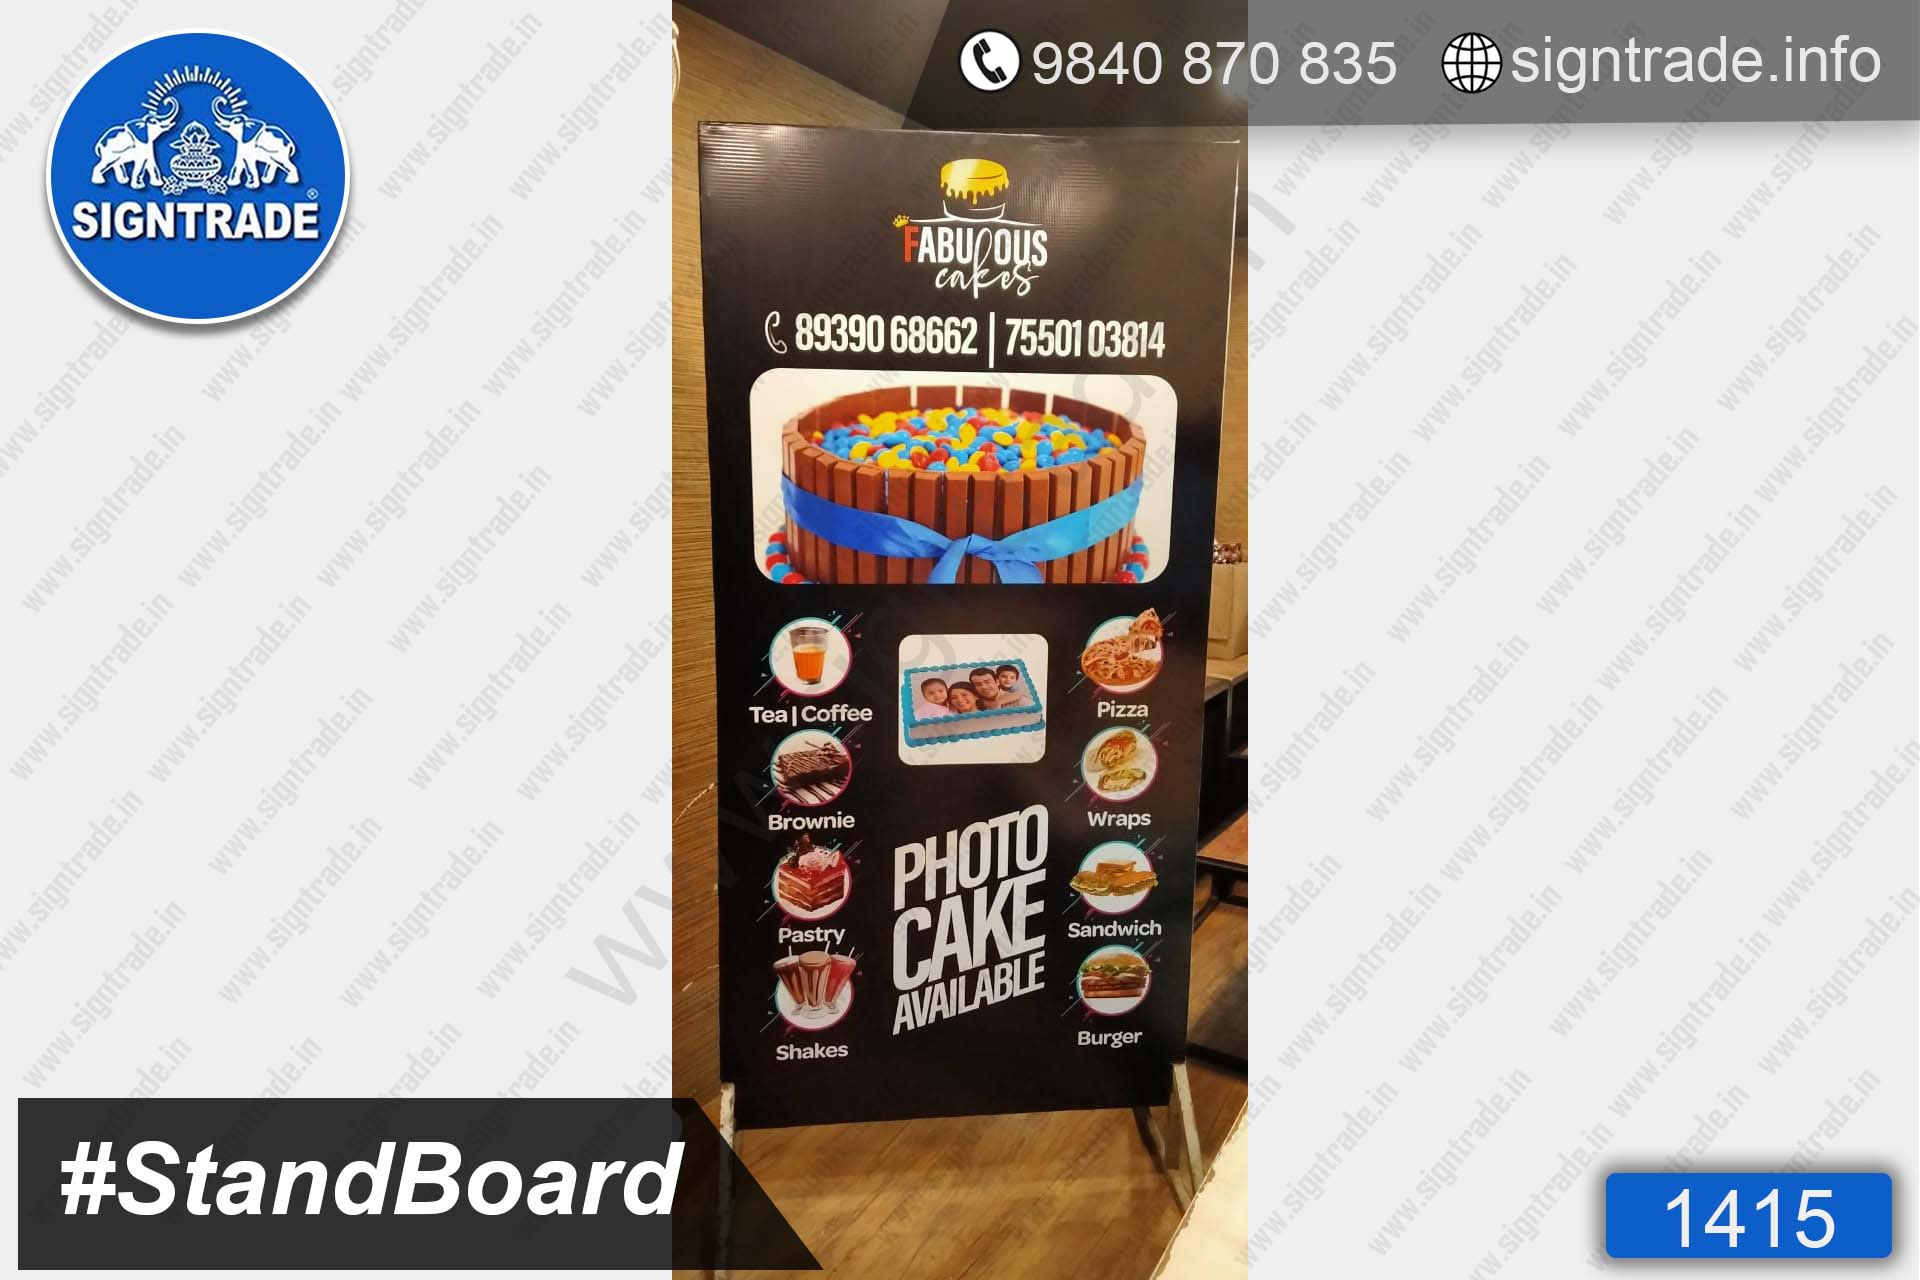 Fabulous Cakes - 1415, Stand Up Flex Board, Flex Board, Shop front flex board, a board, board, Custom stand board